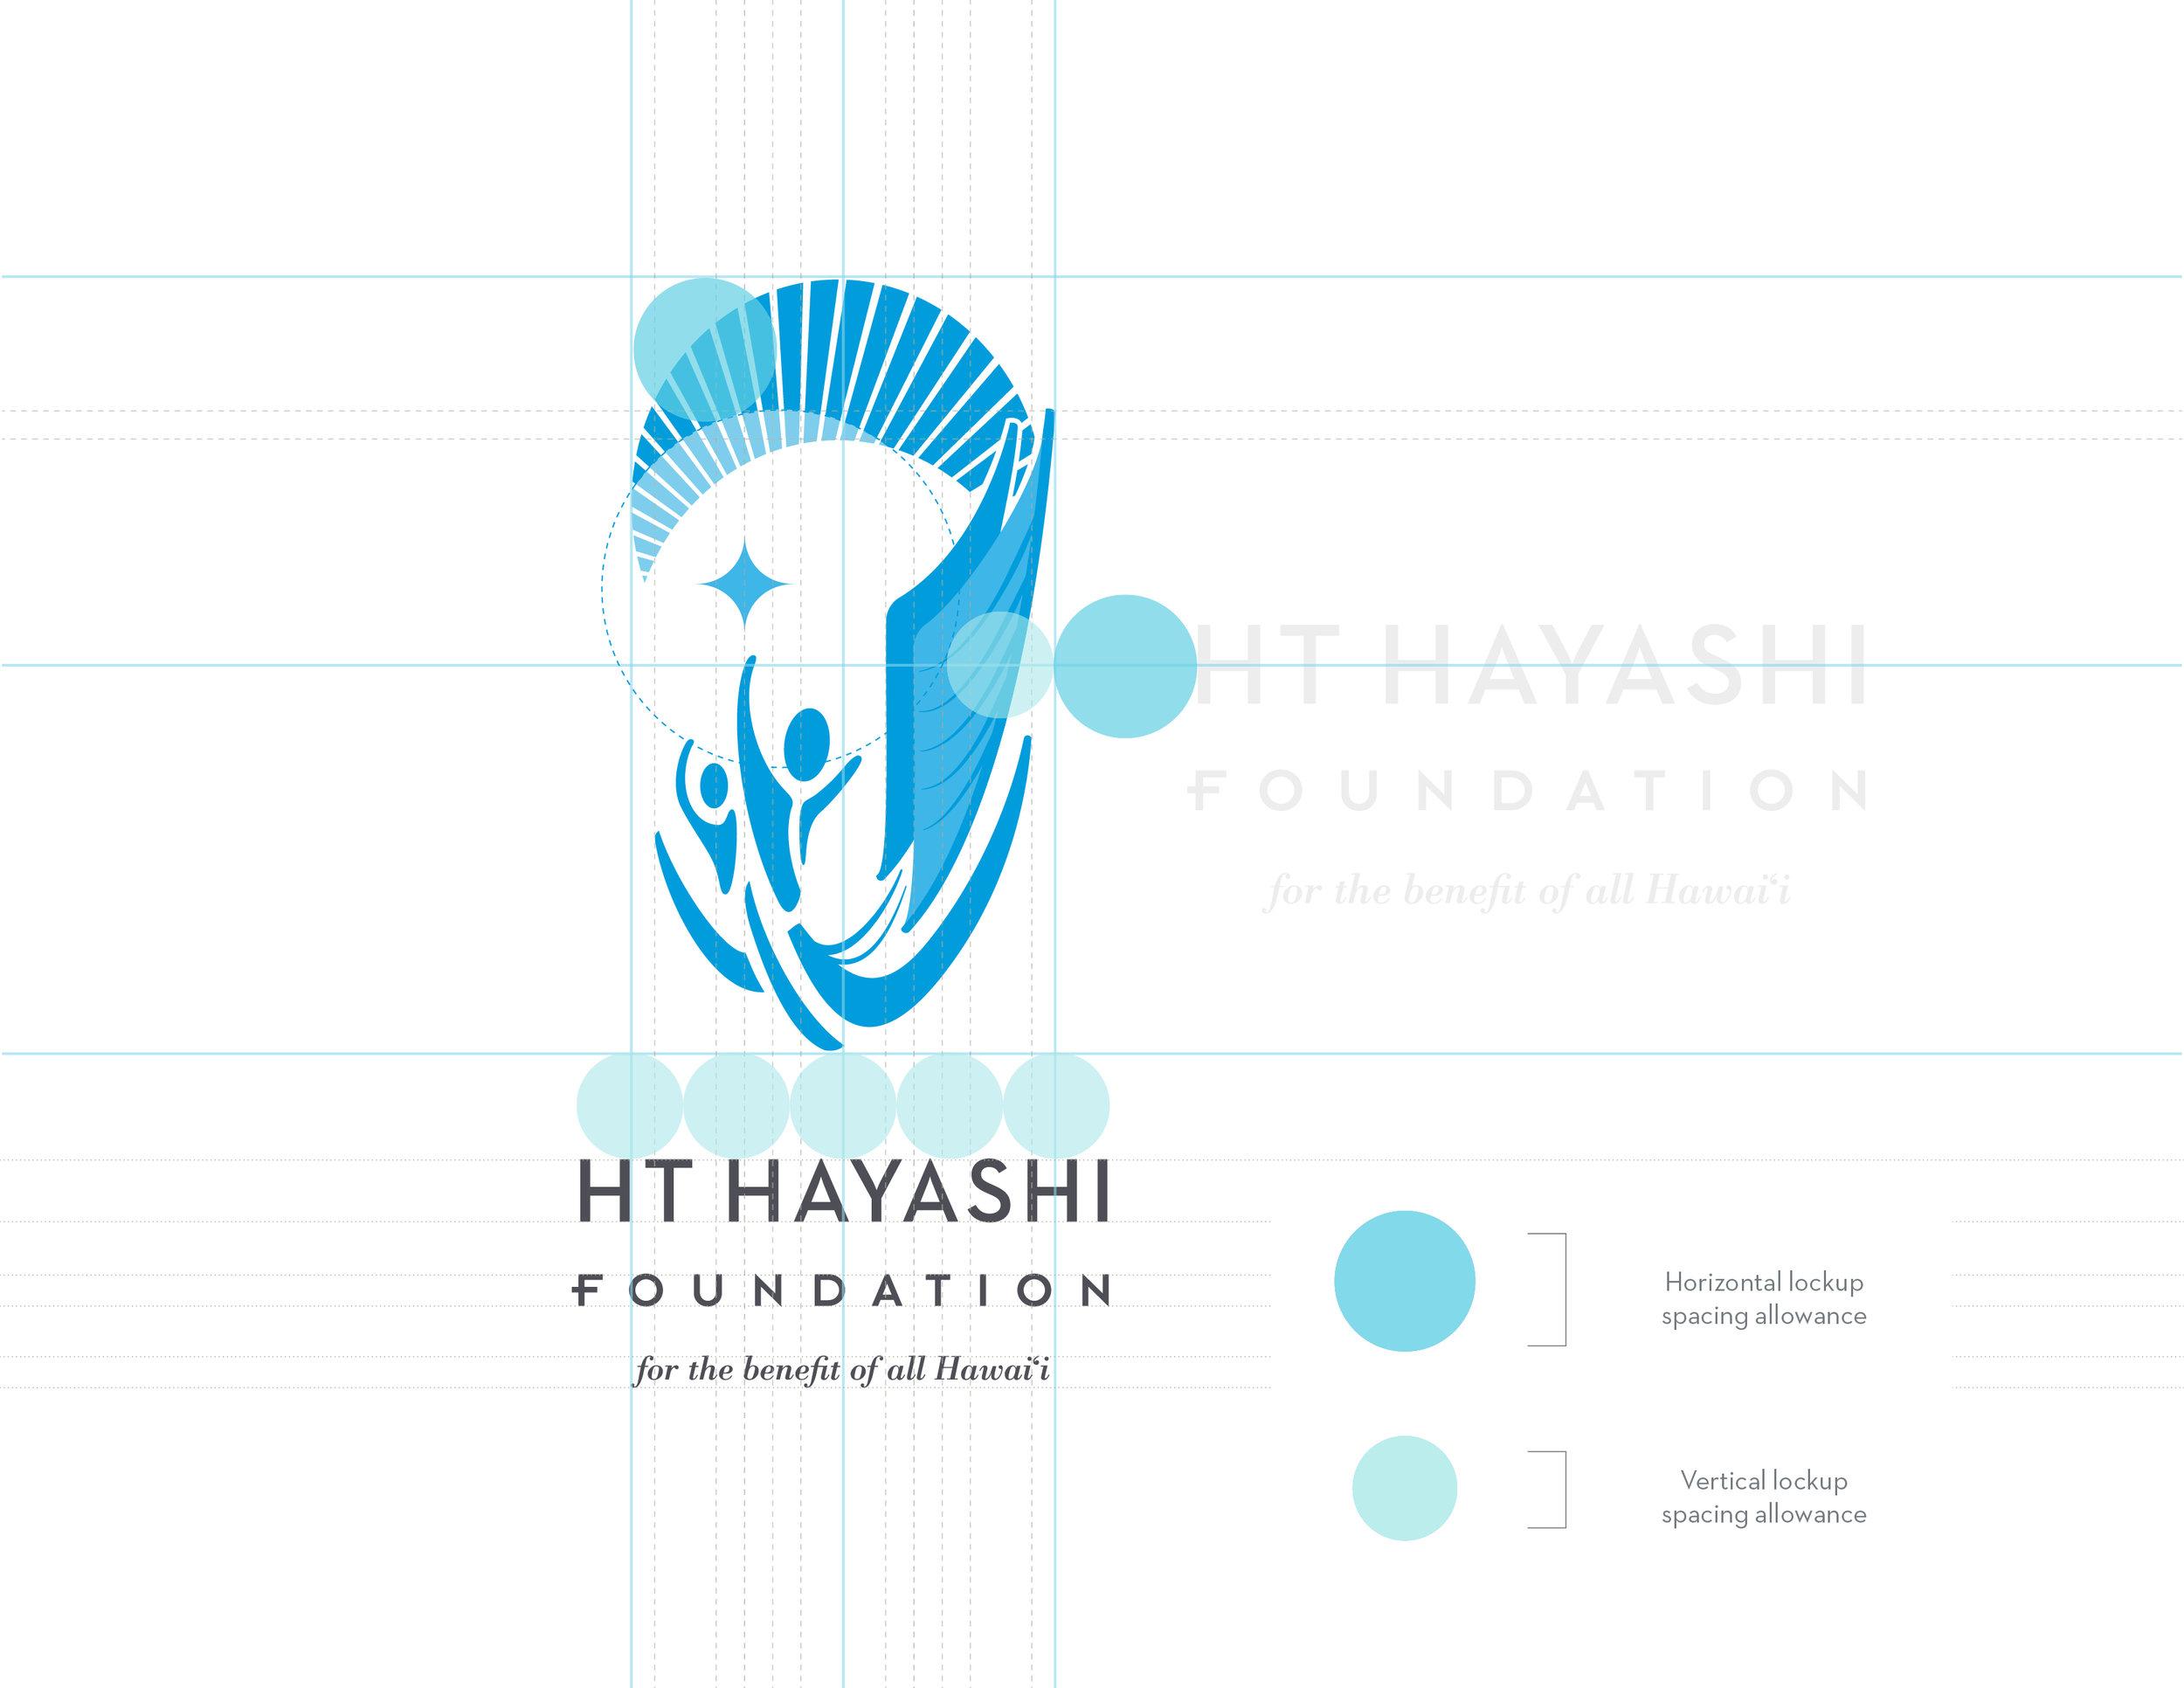 HTHFoundation3.jpg